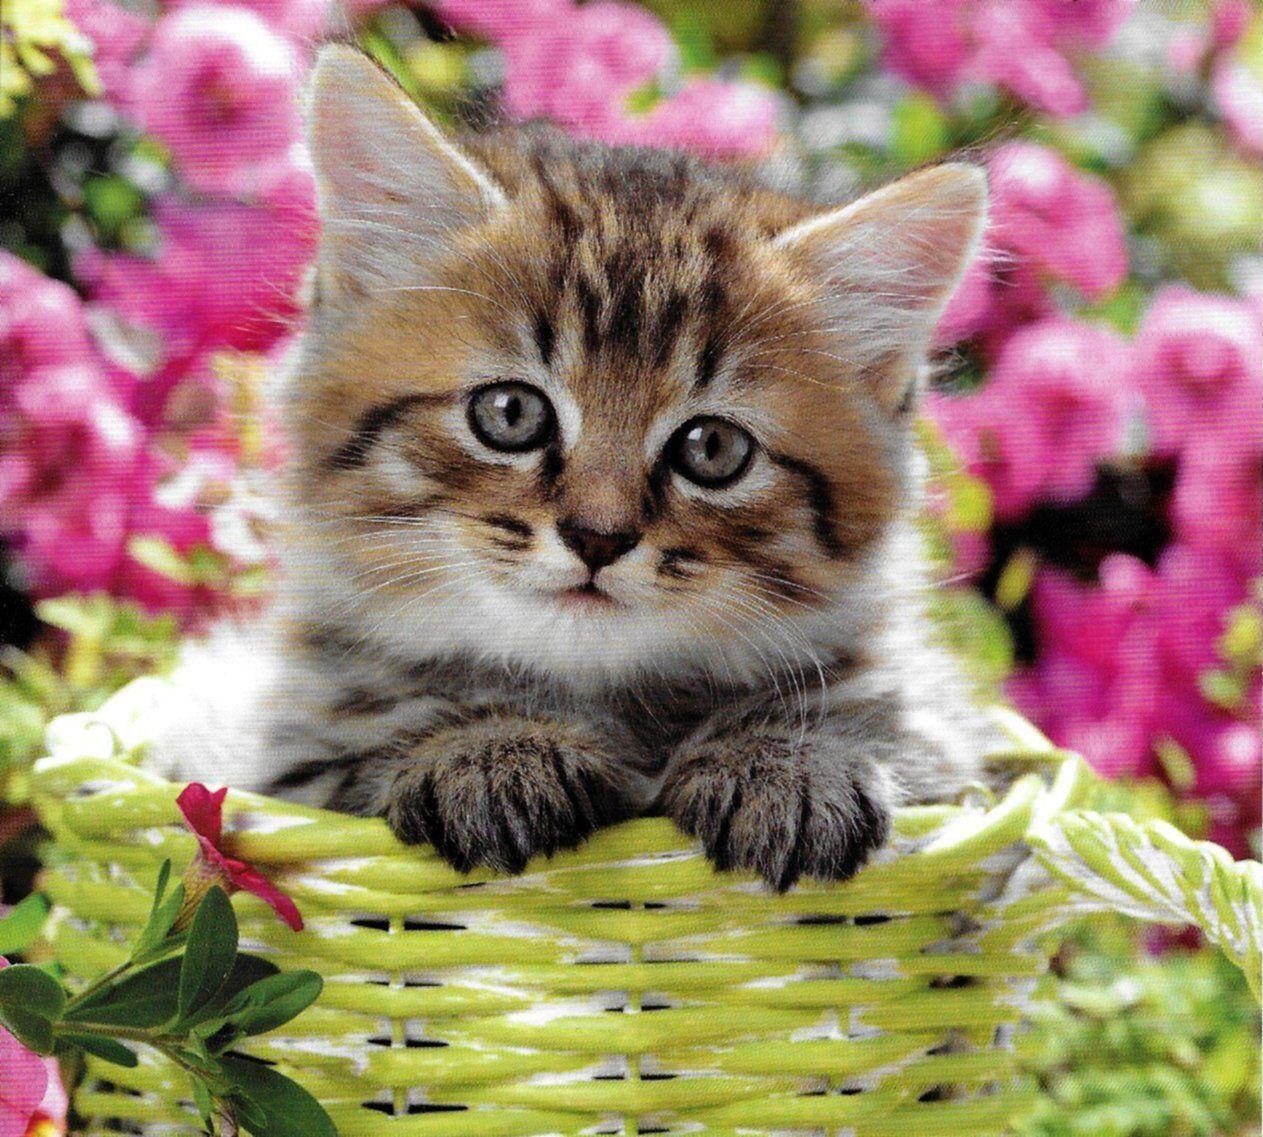 Cute Little Fluffy Tabby Kitten Aww! ♥ Cute Fluffy